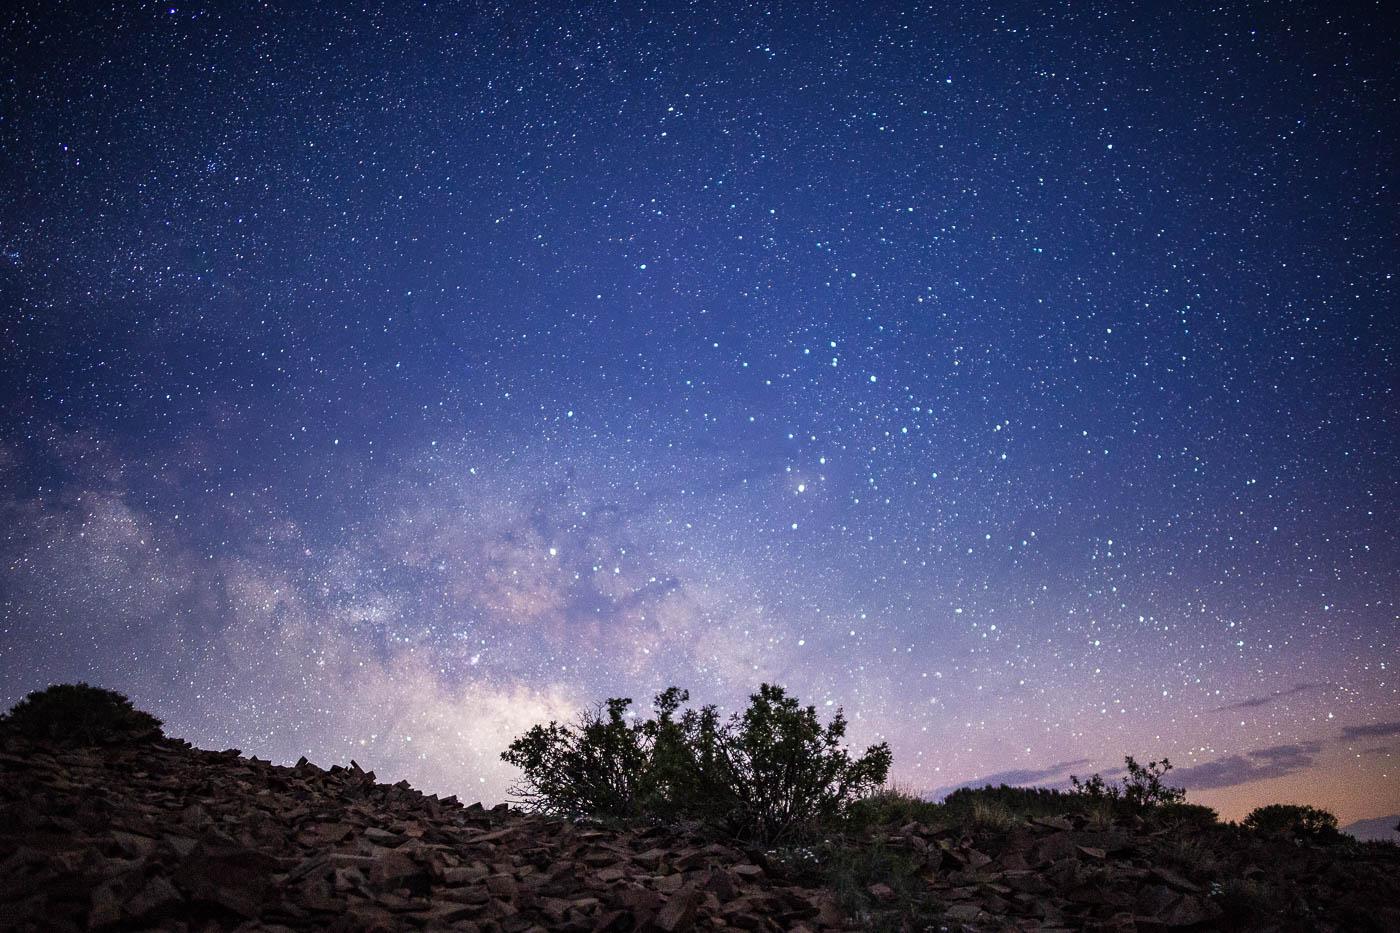 Starry Sky Over White Mountain